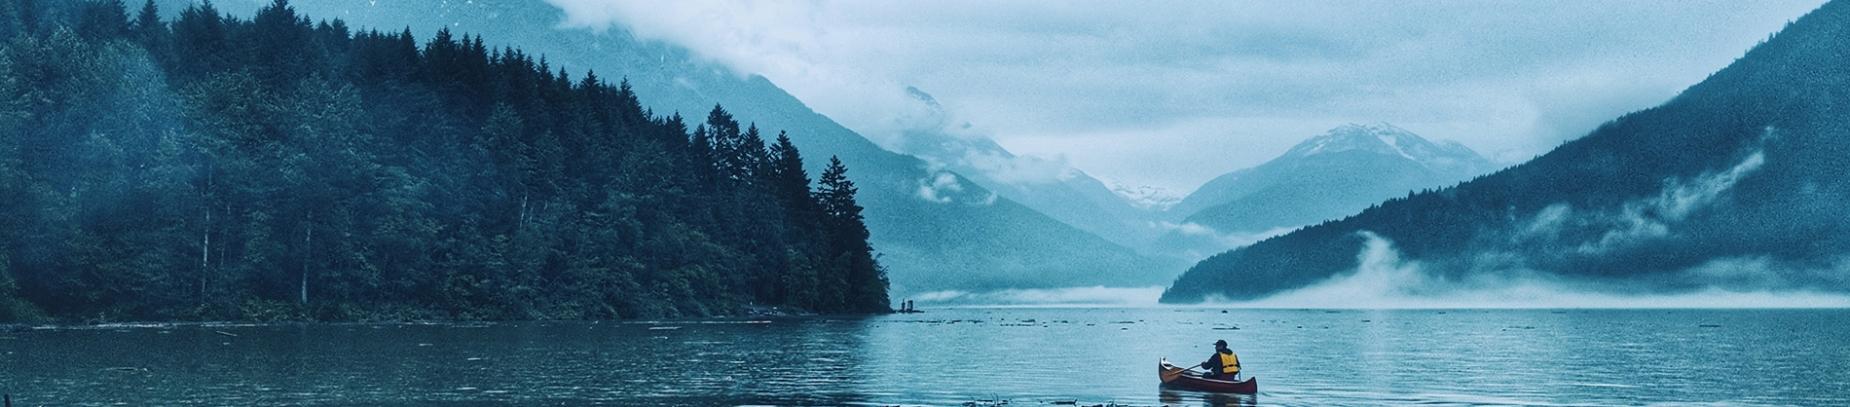 A man in a canoe rowing across a lake